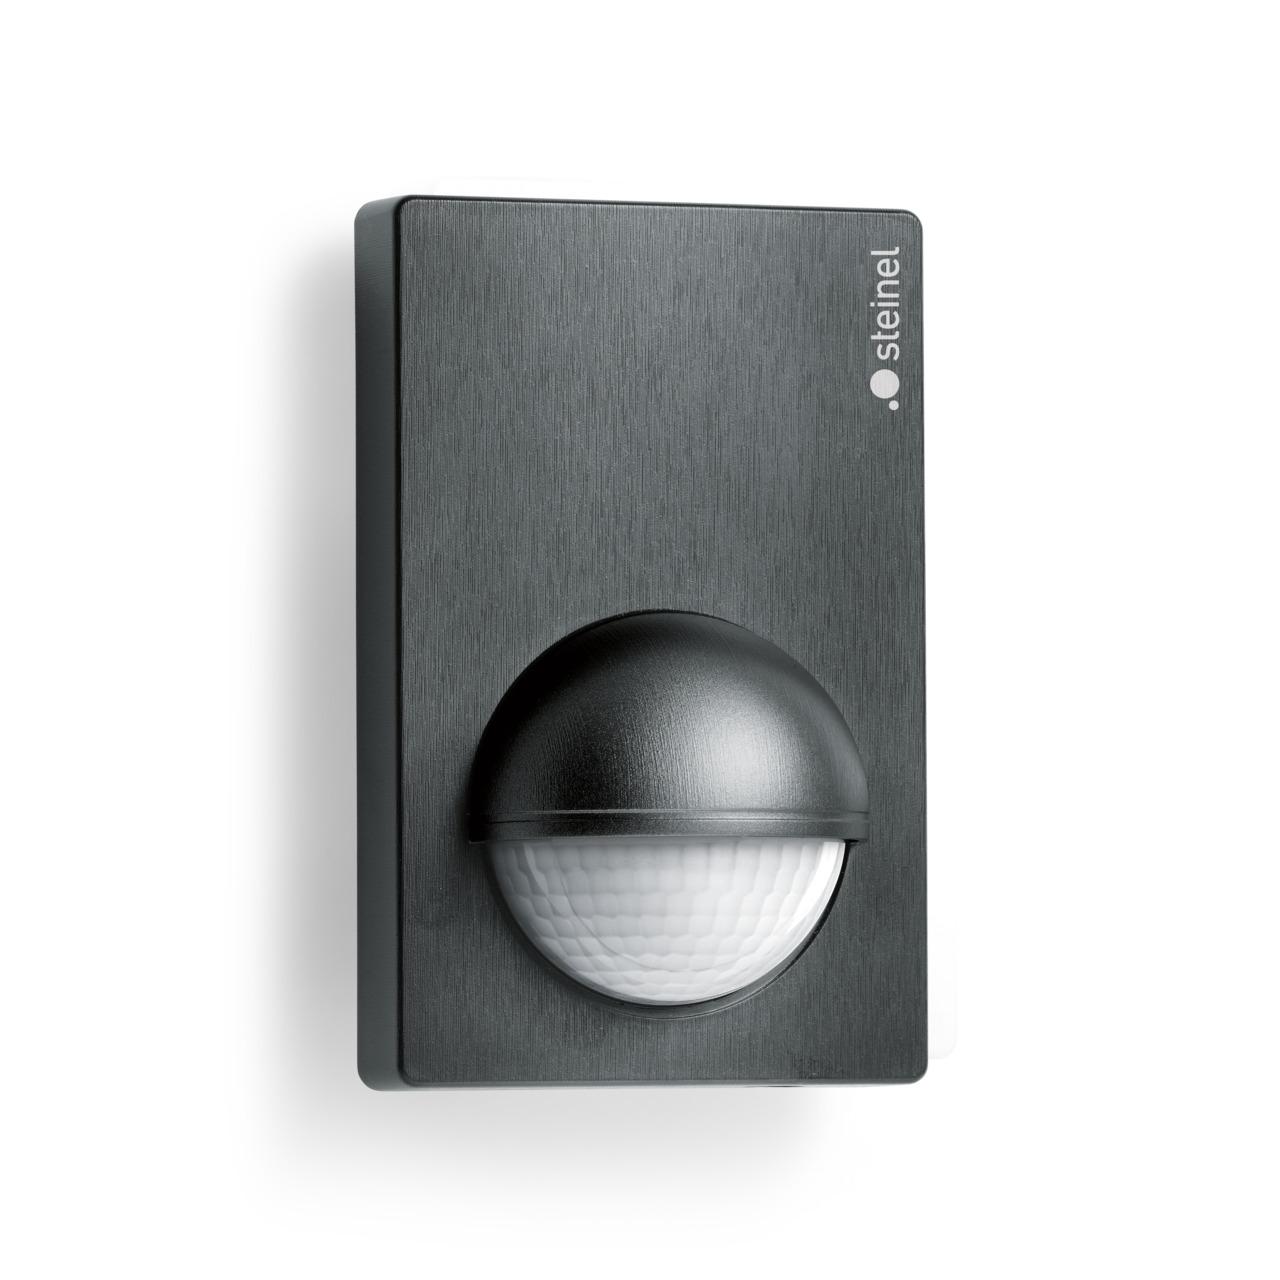 STEINEL IS 180-2 INOX-Look Infrarot-Bewegungsmelder